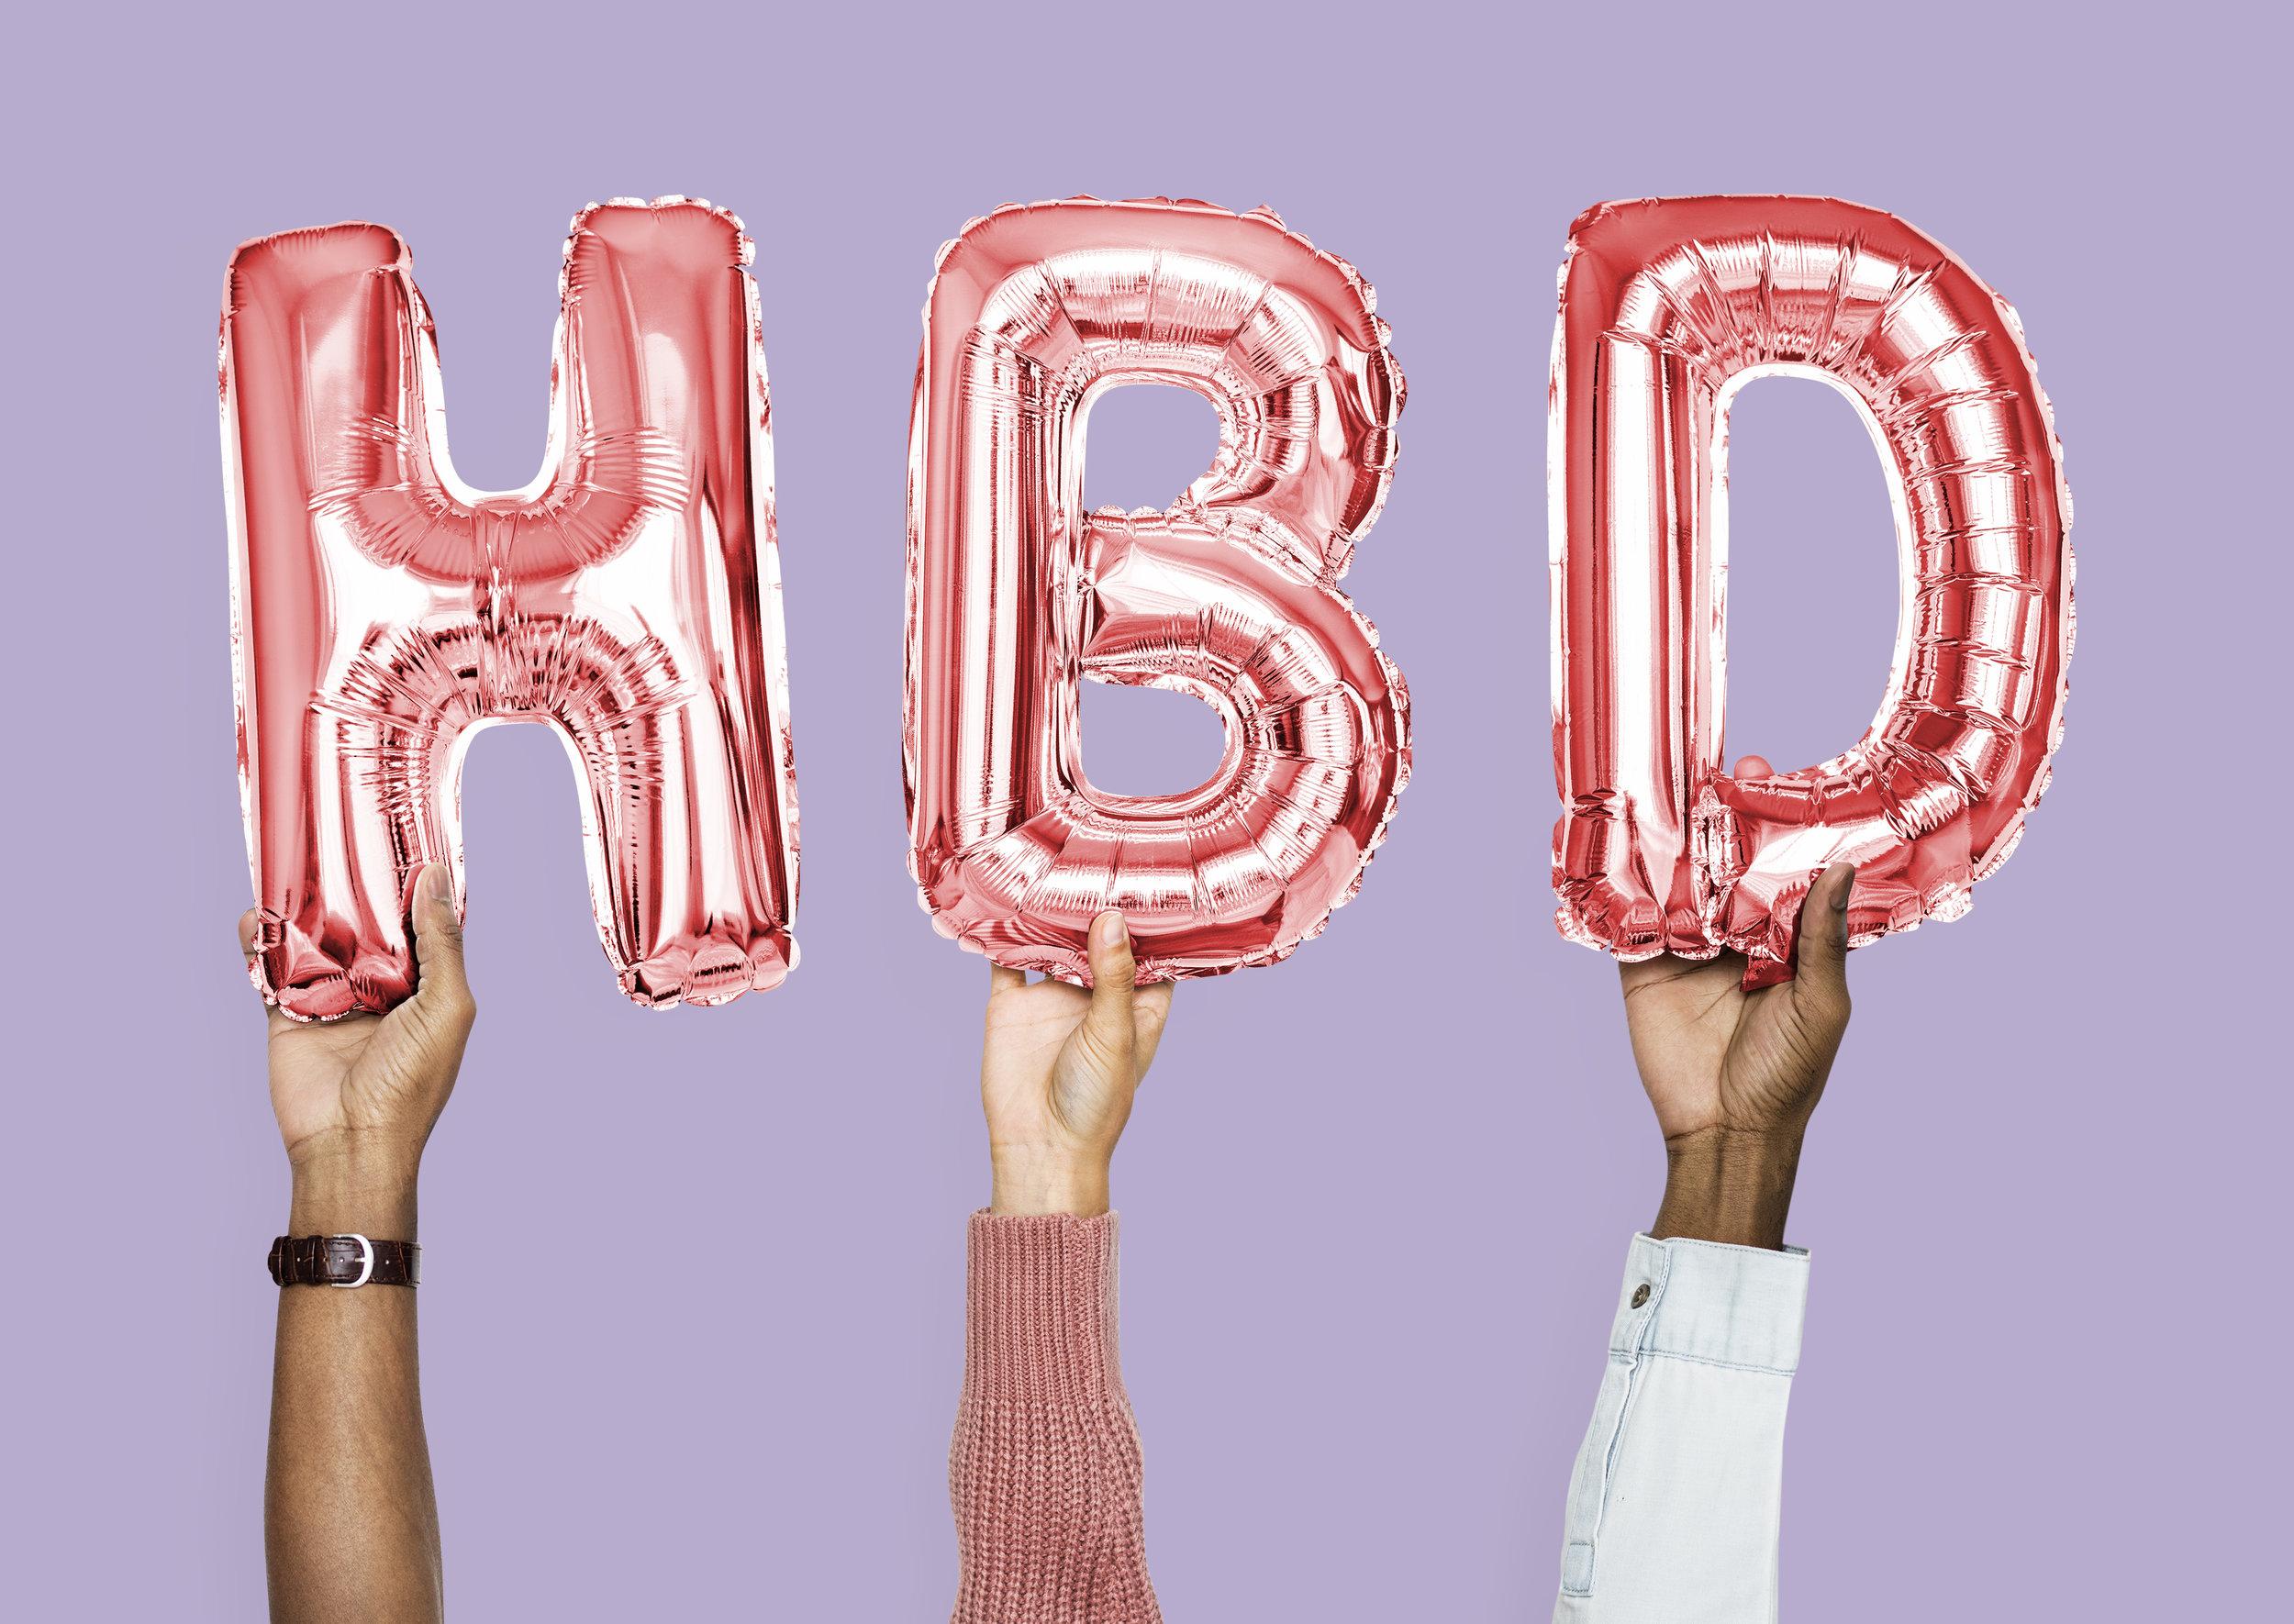 Birthday Parties - Fun and creative birthday party ideas for adults~ 20th - 30th birthday - 40th birthday - 50th birthday and more ~